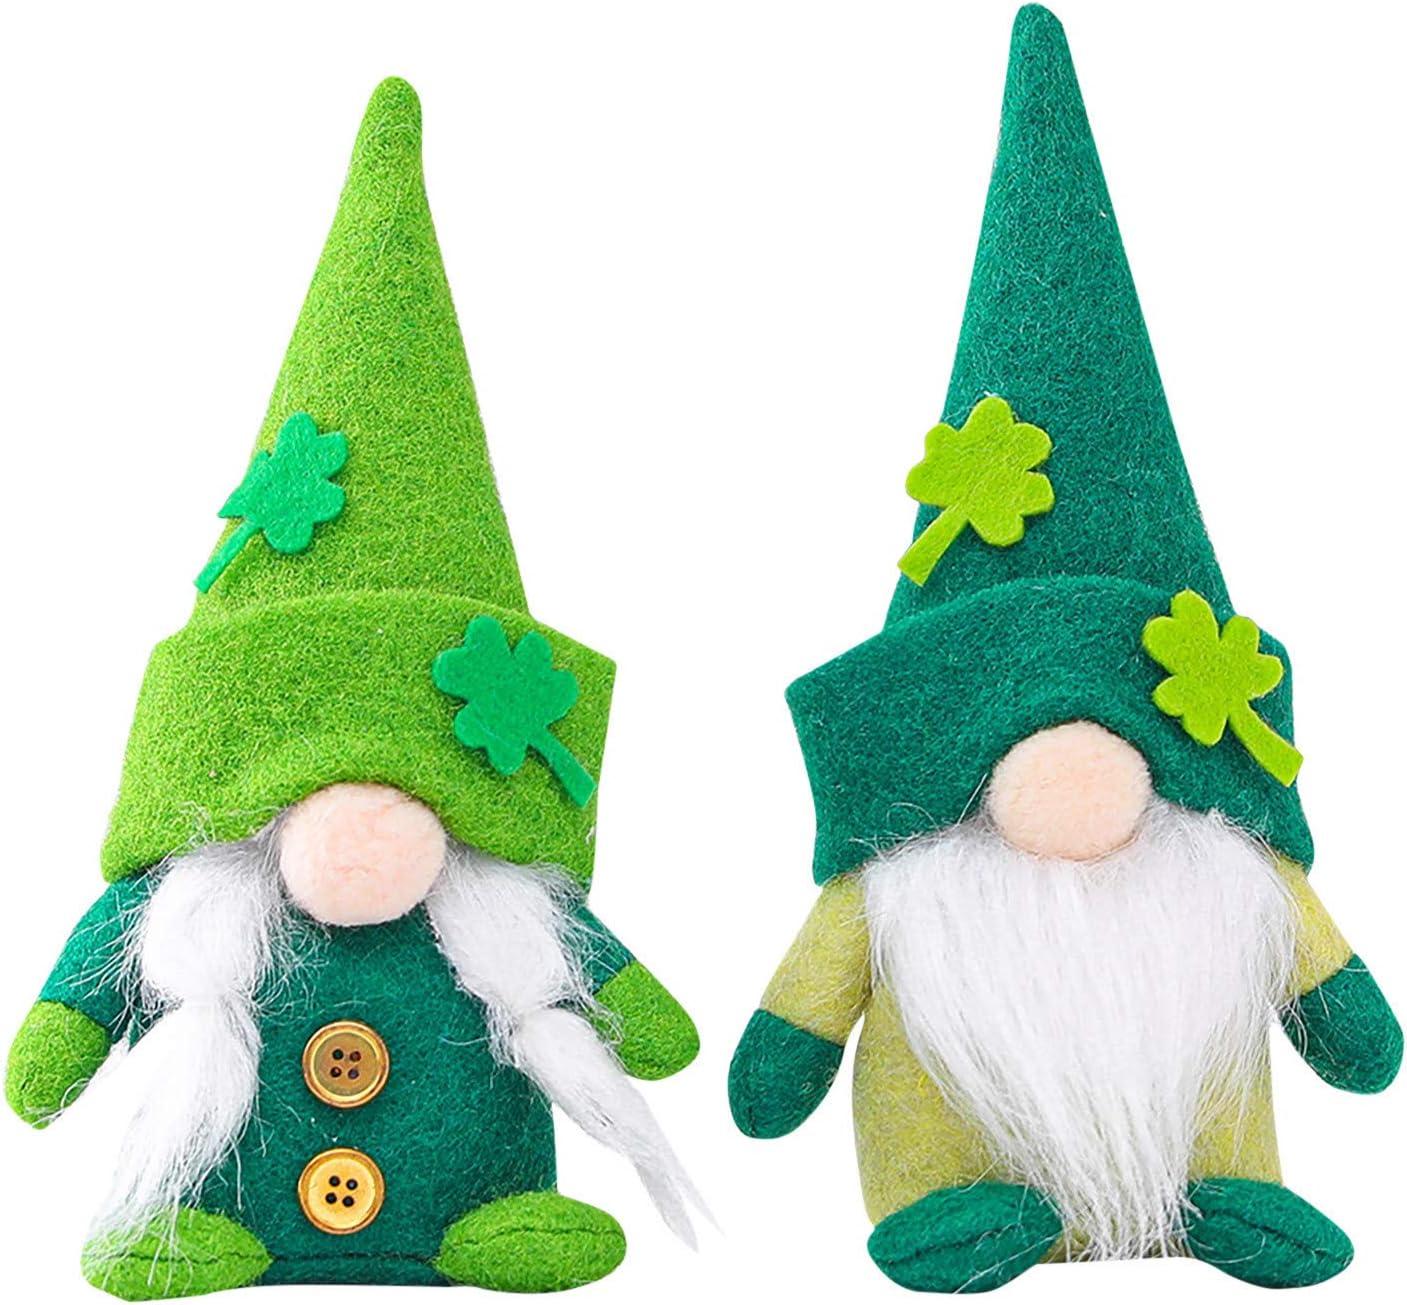 Fastbot St.Patrick's Day Gnome Plush Elf Decorations, Green Hat Doll Faceless Elderly Irish Festival Lucky Clover Hanging Ornament, Saint Patrick's Day Irish Decorations